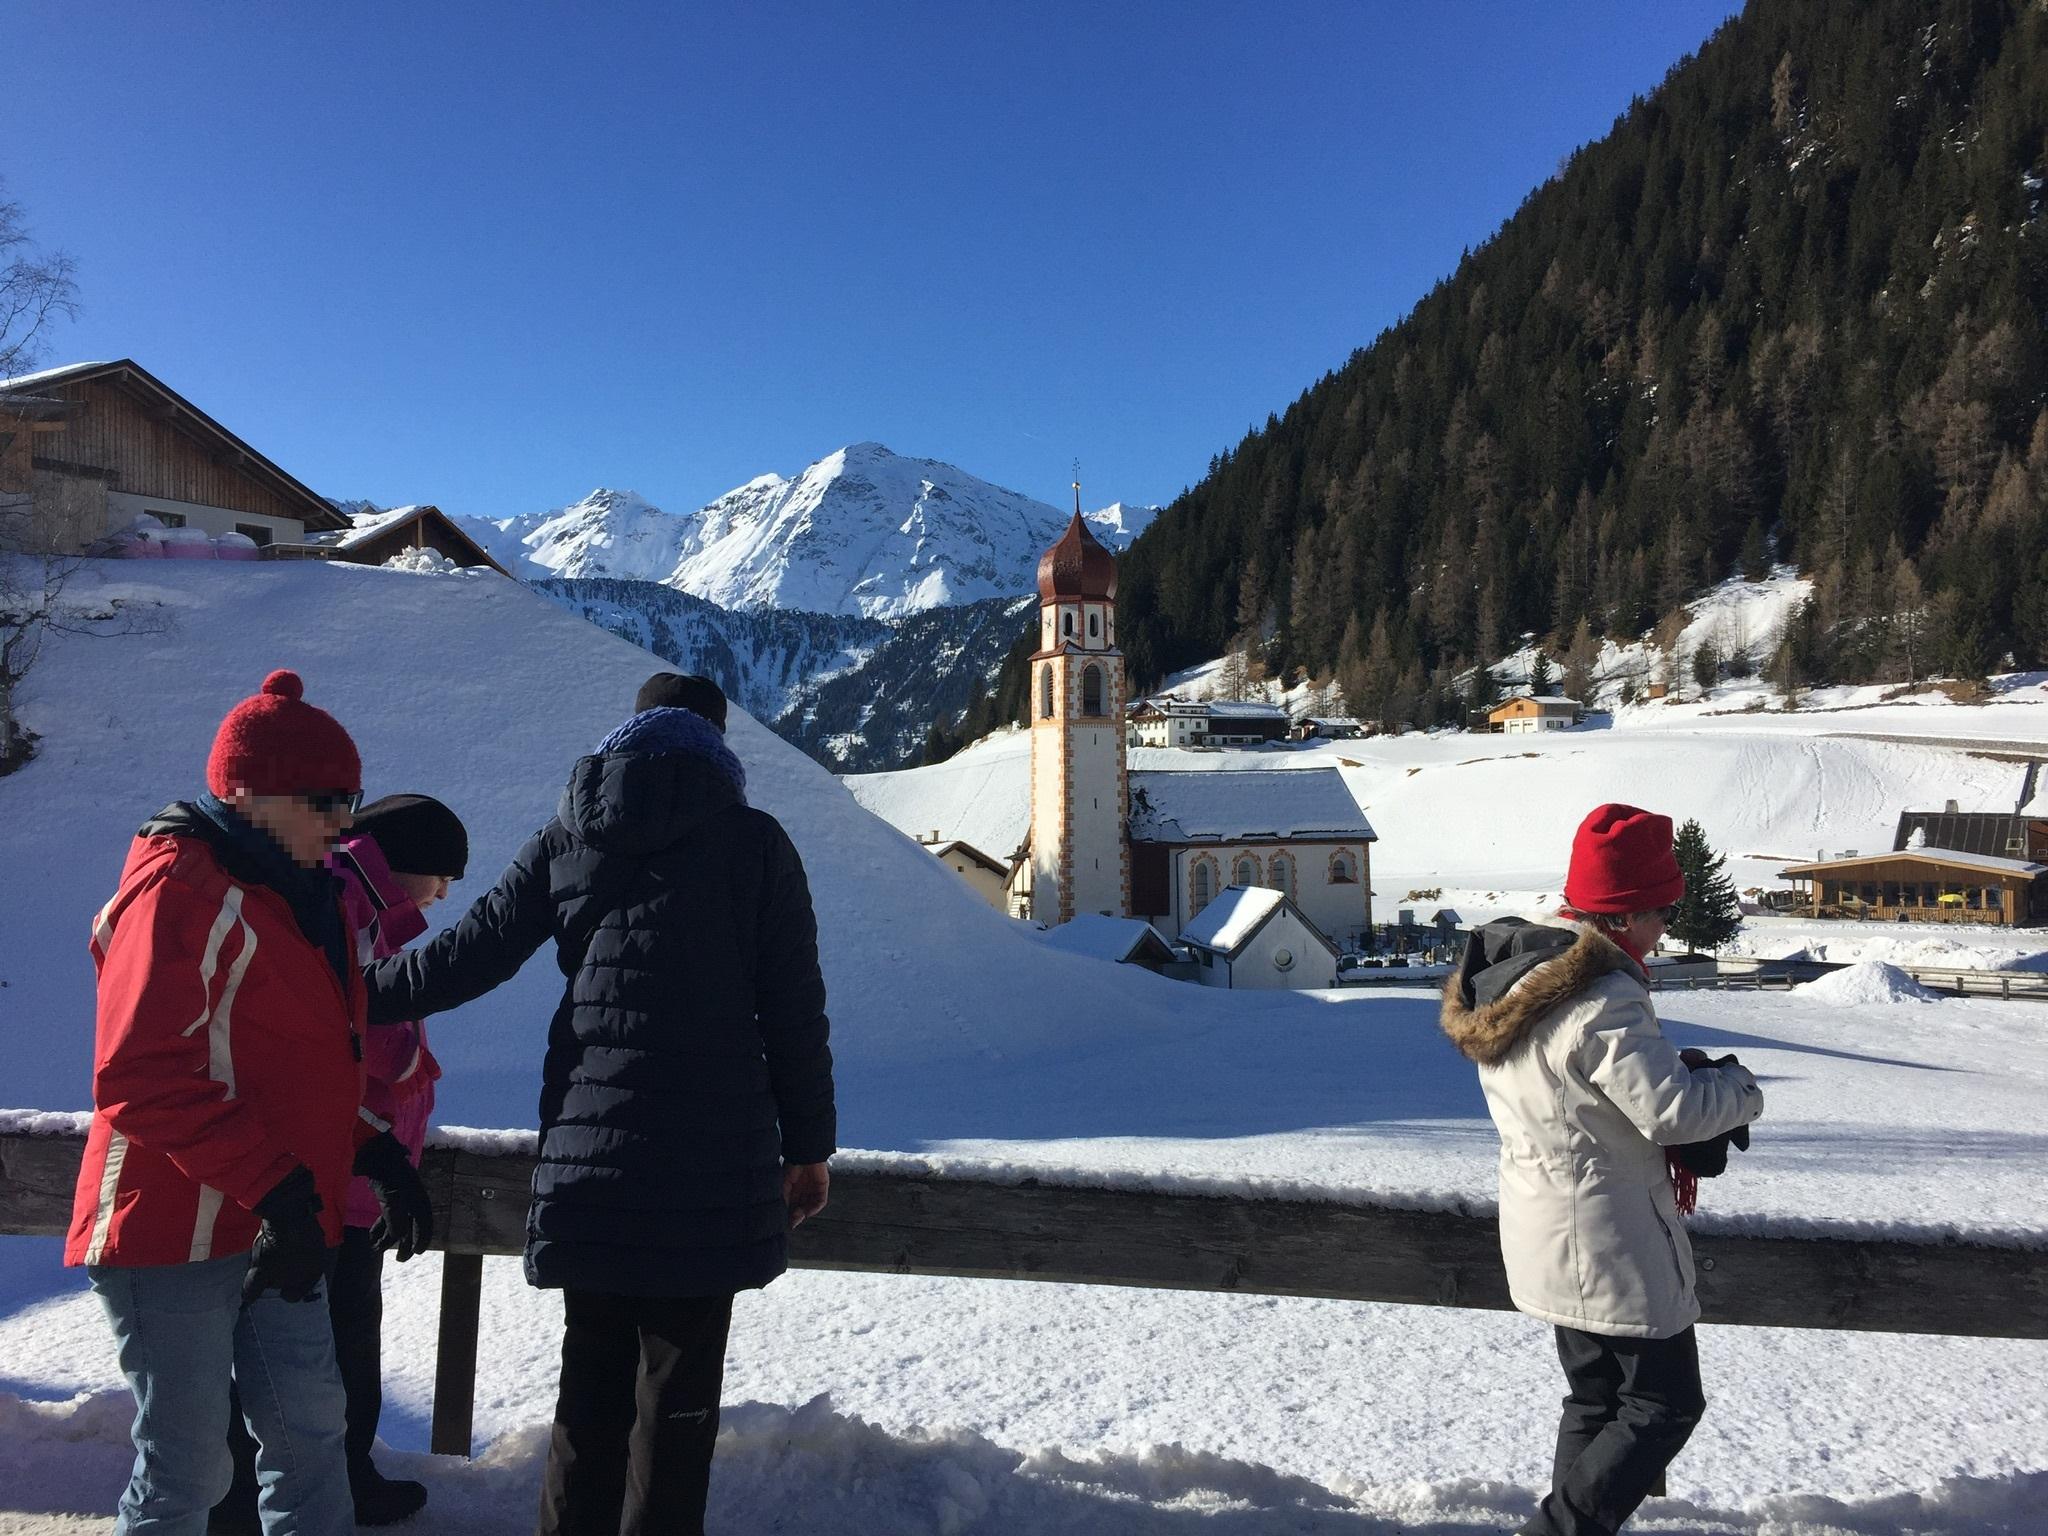 Oostenrijk Längenfeld (Tirol) Hotel Edelweiss Winterreis